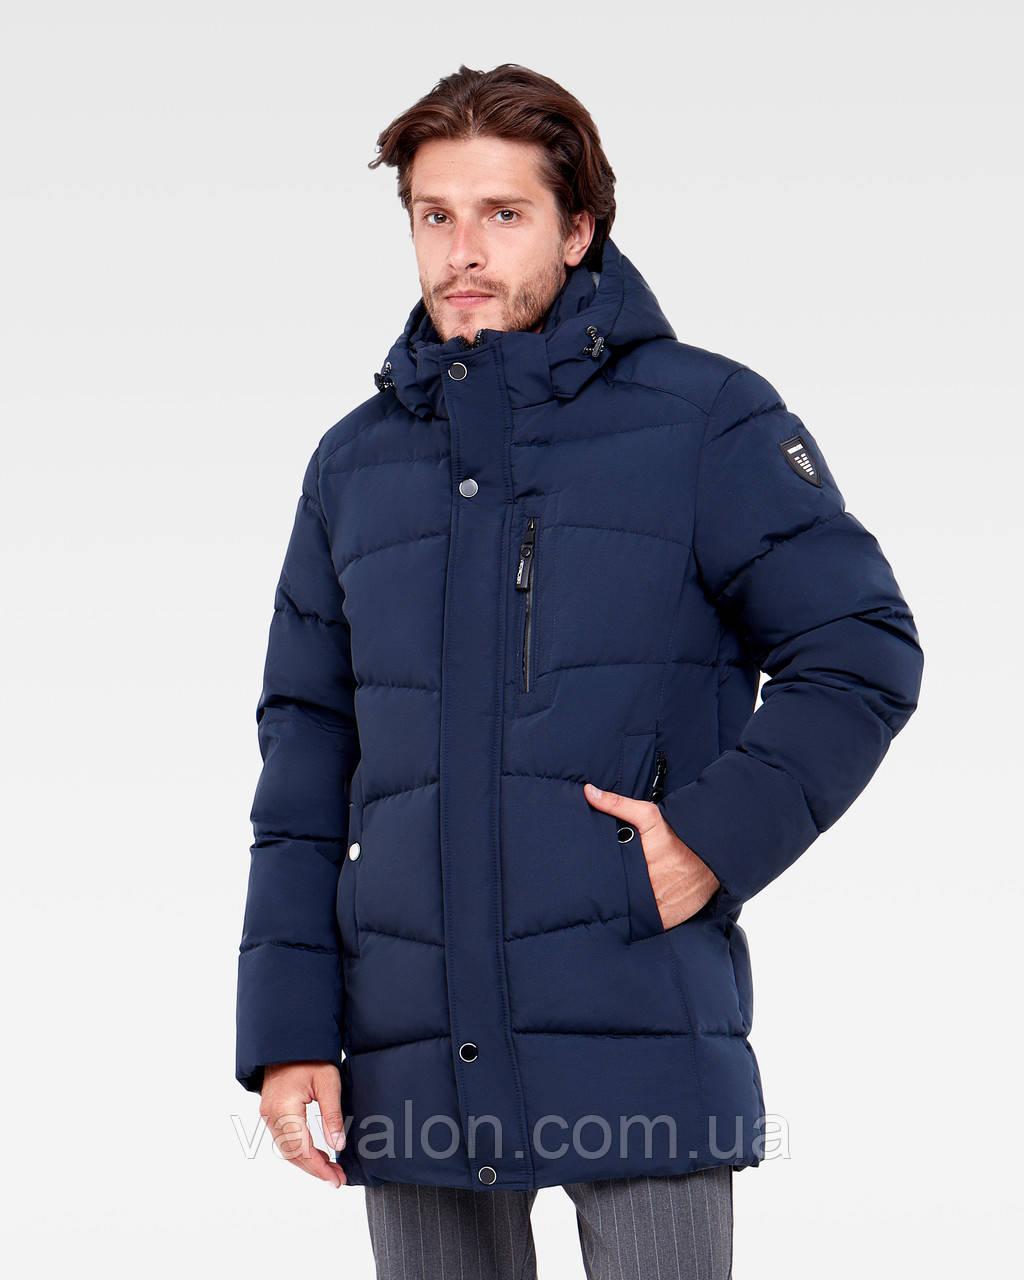 Зимняя мужская куртка Vavalon KZ-P248 navy